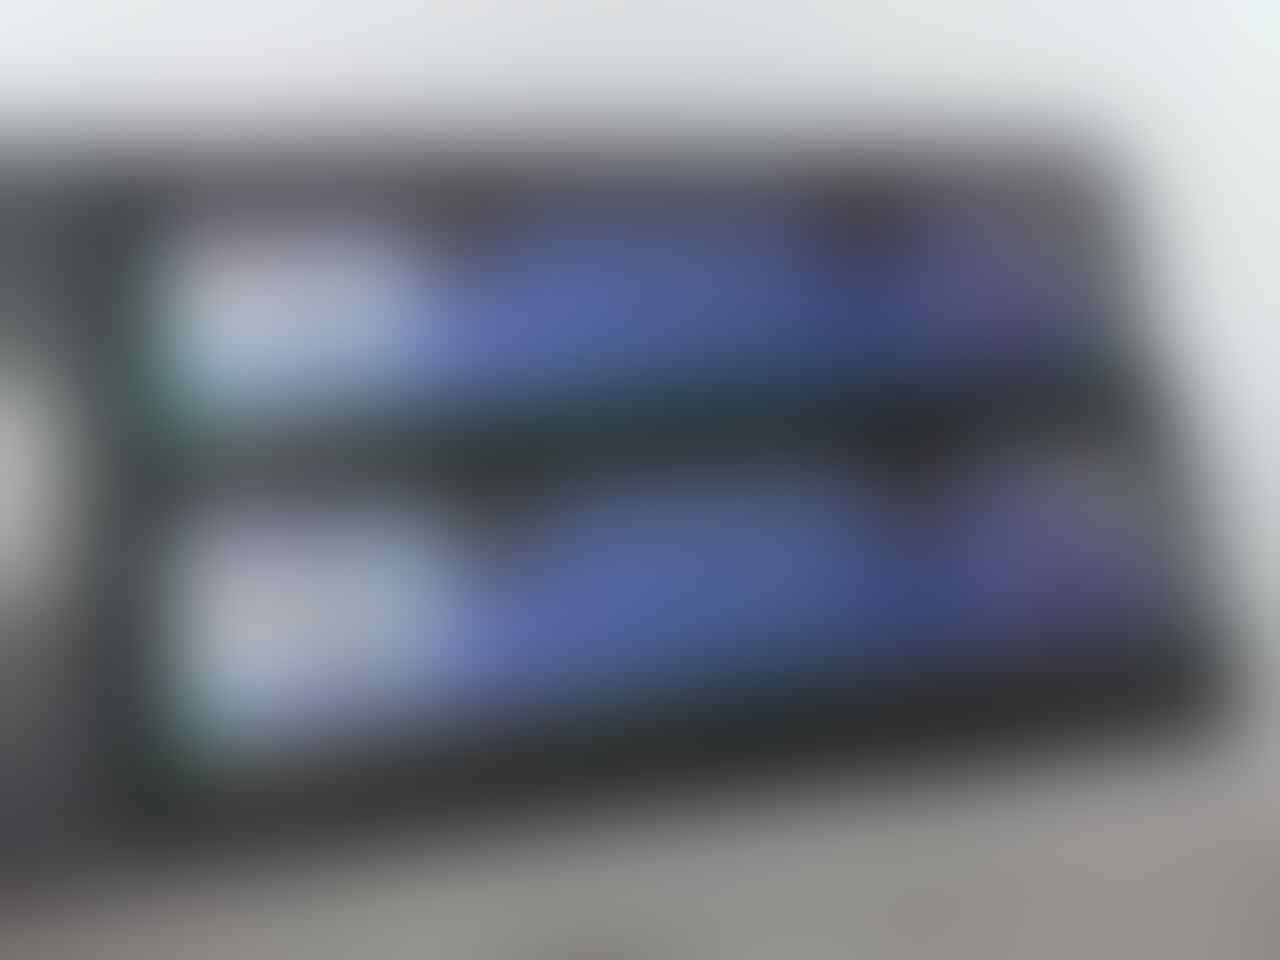 Intel E8500 + 4GB Kingstone HyperX DDR2 PC 6400 + Seagete 500GB